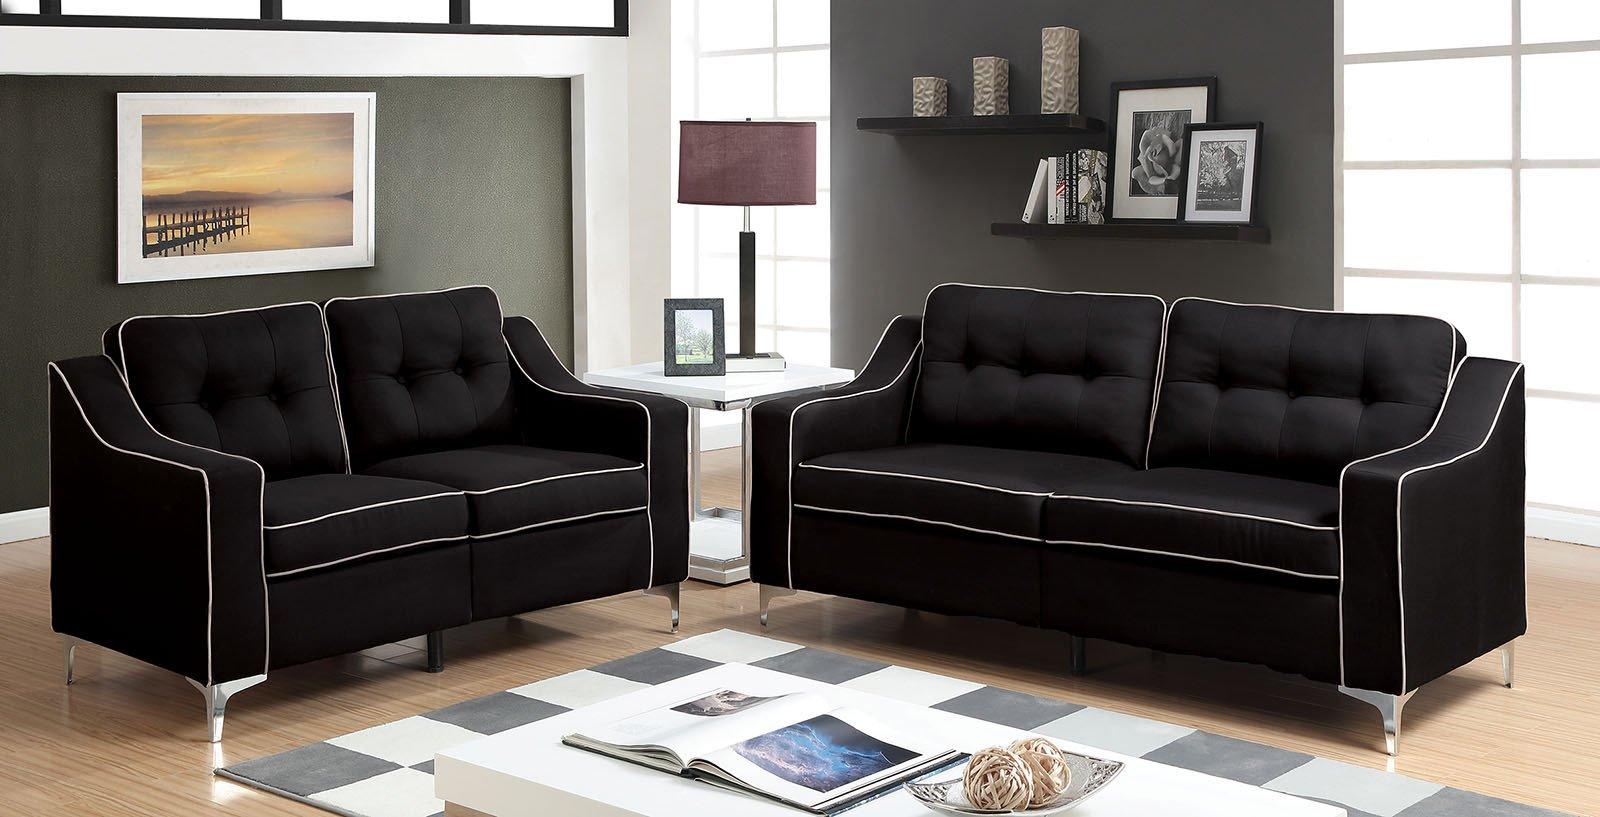 Contemporary Living Room sofas Glenda Contemporary Style Black Fabric sofa & Loveseat